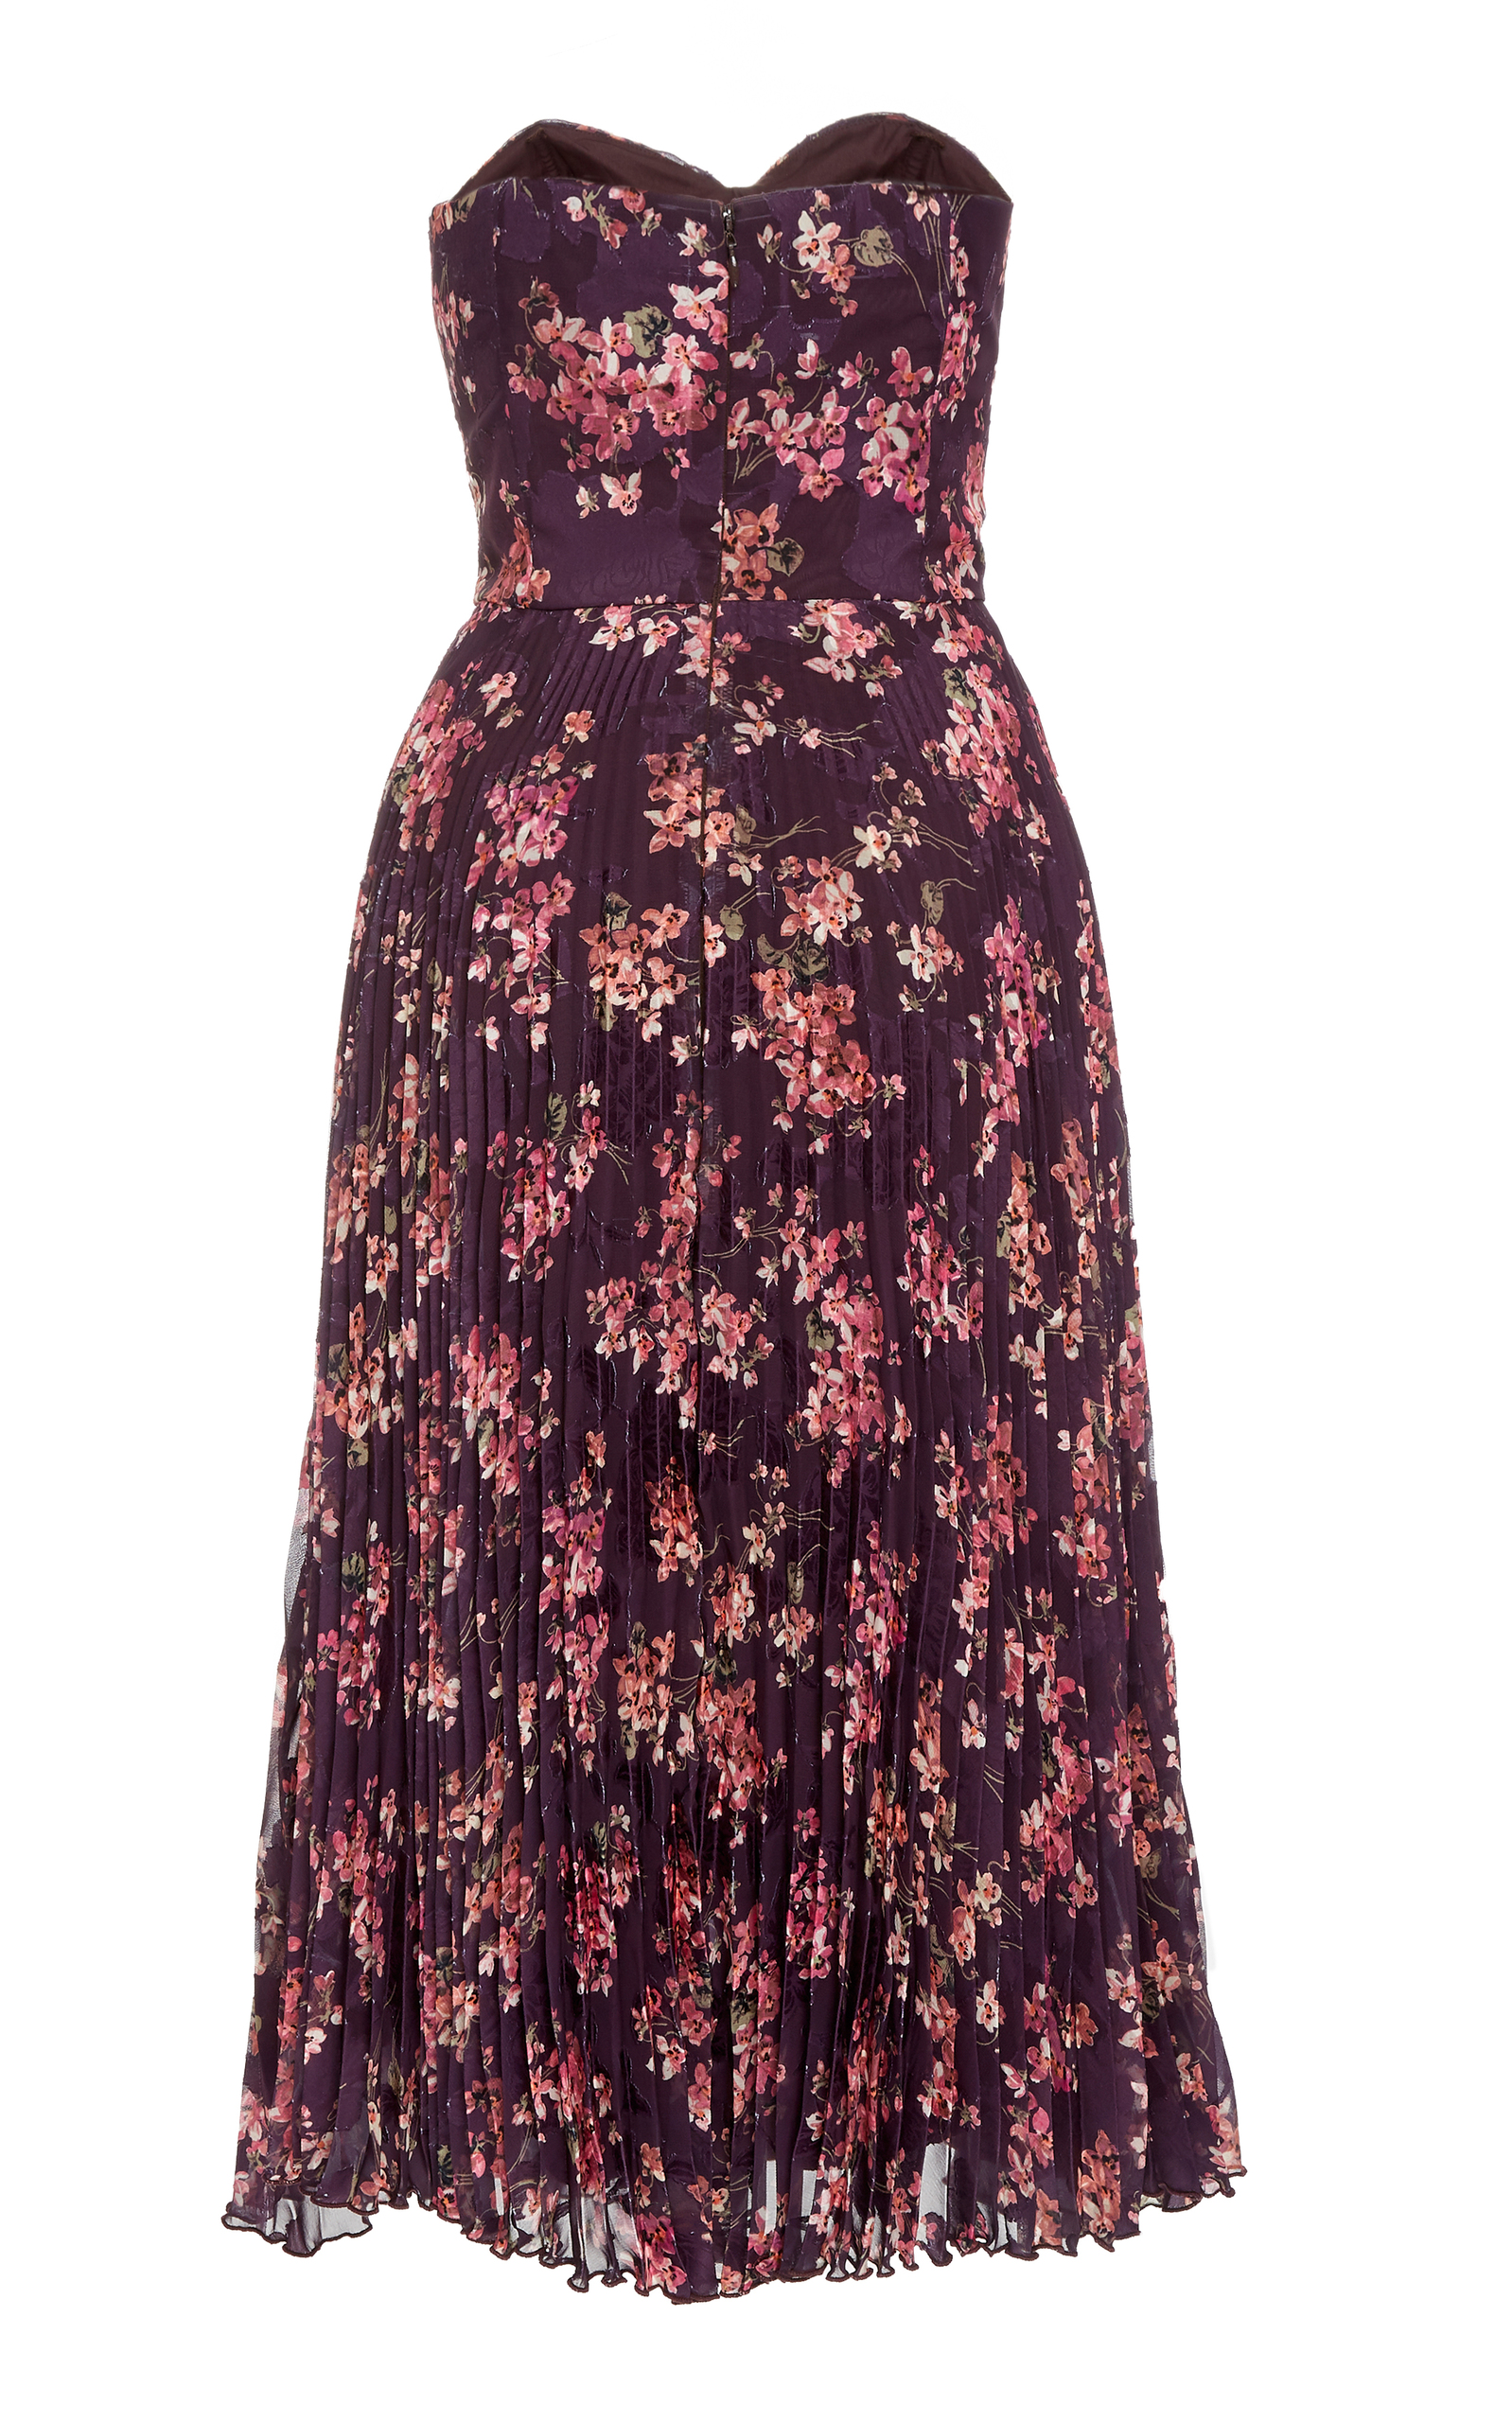 7bce6ed6acc Violets Jacquard Strapless Dress by Anna Sui